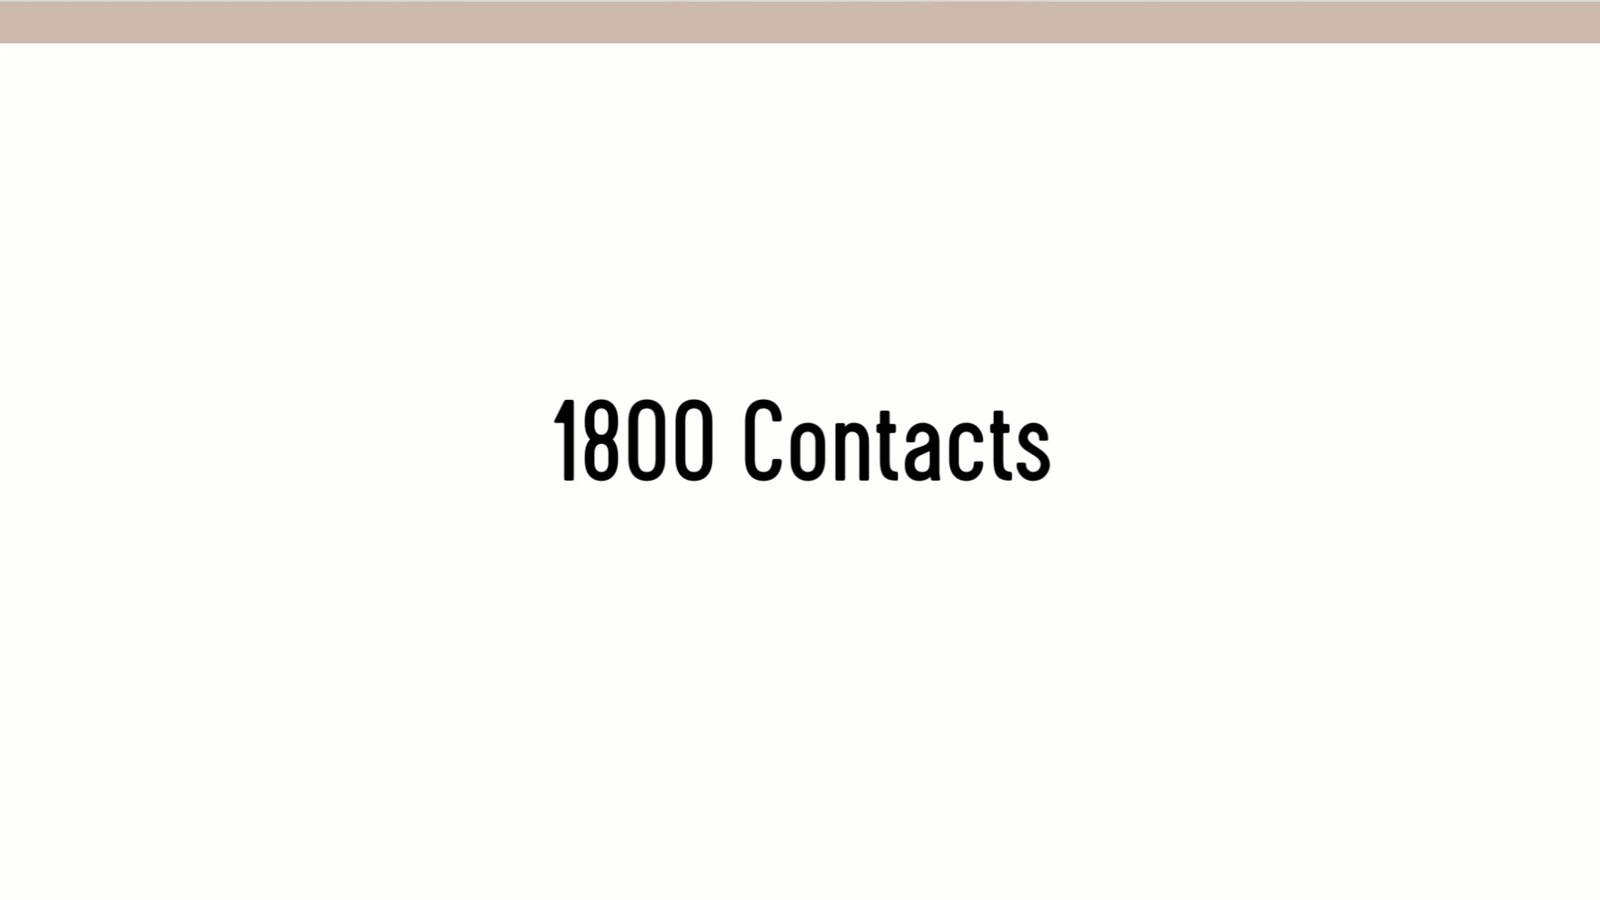 discover deals 1800contacts